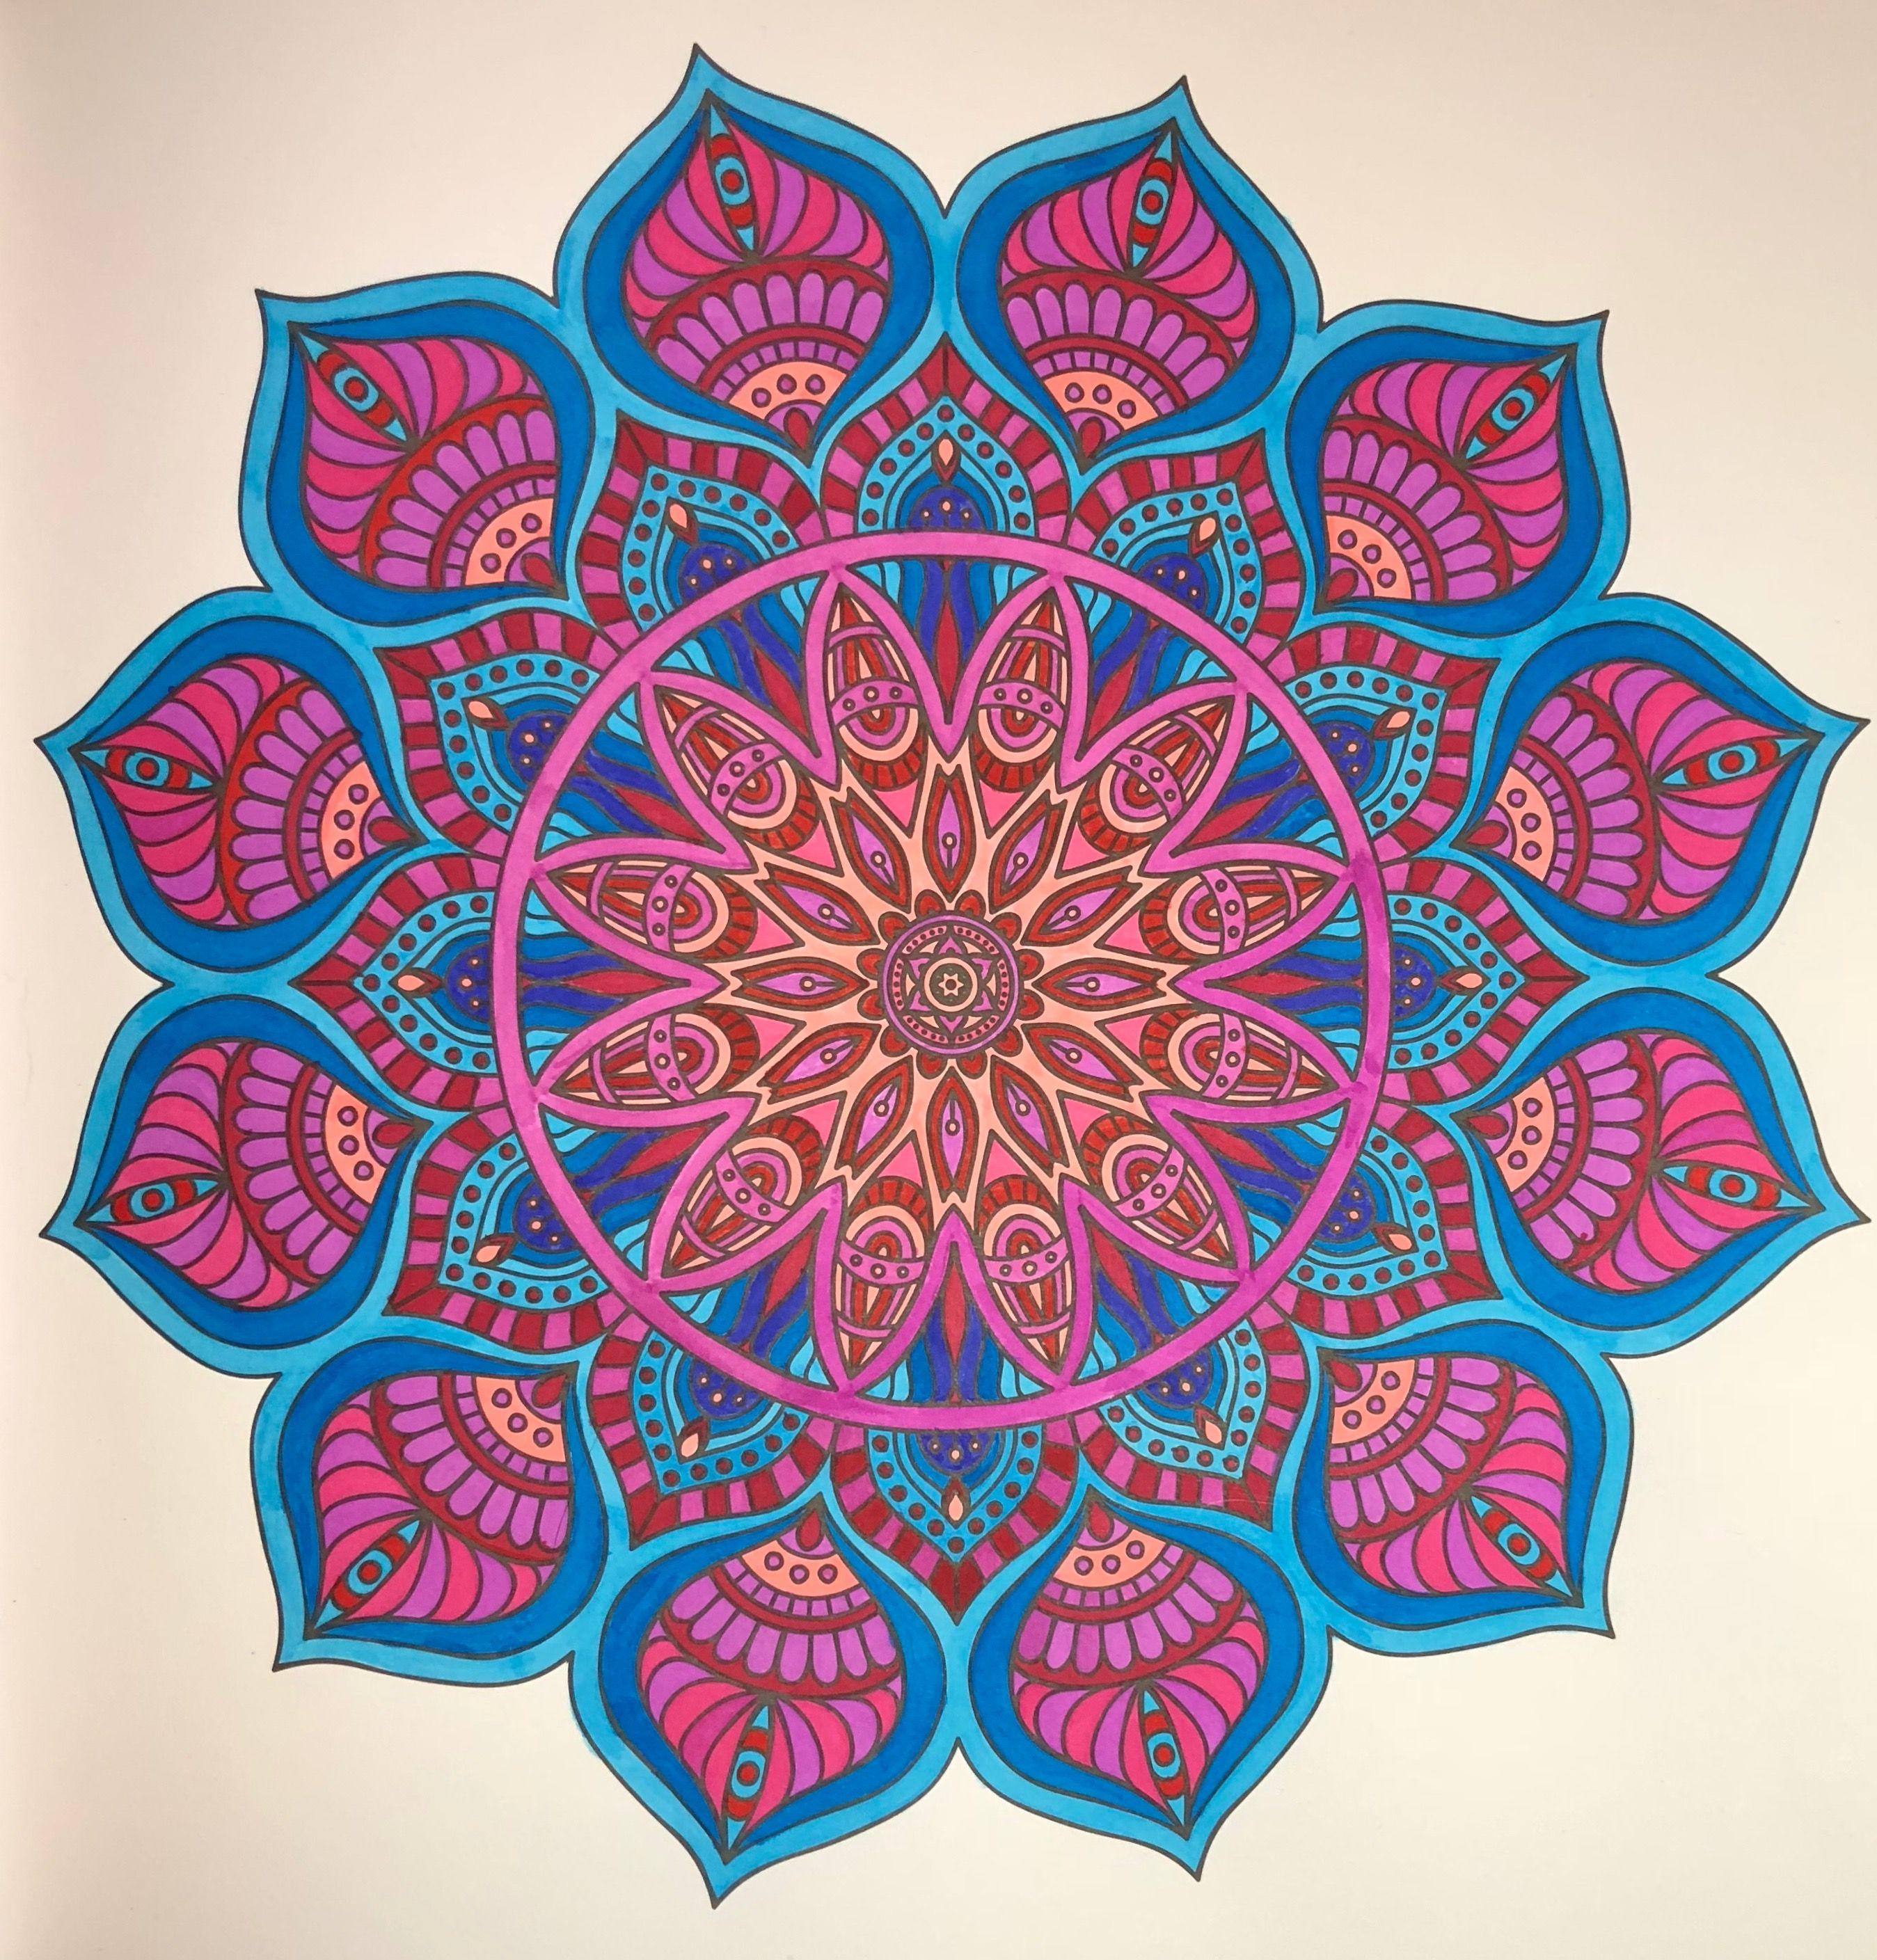 Yoga And Meditation Coloring Book For Adults With Yoga Poses And Mandalas Paginas Para Colorear De Animales Dibujos Para Colorear Adultos Libro De Colores